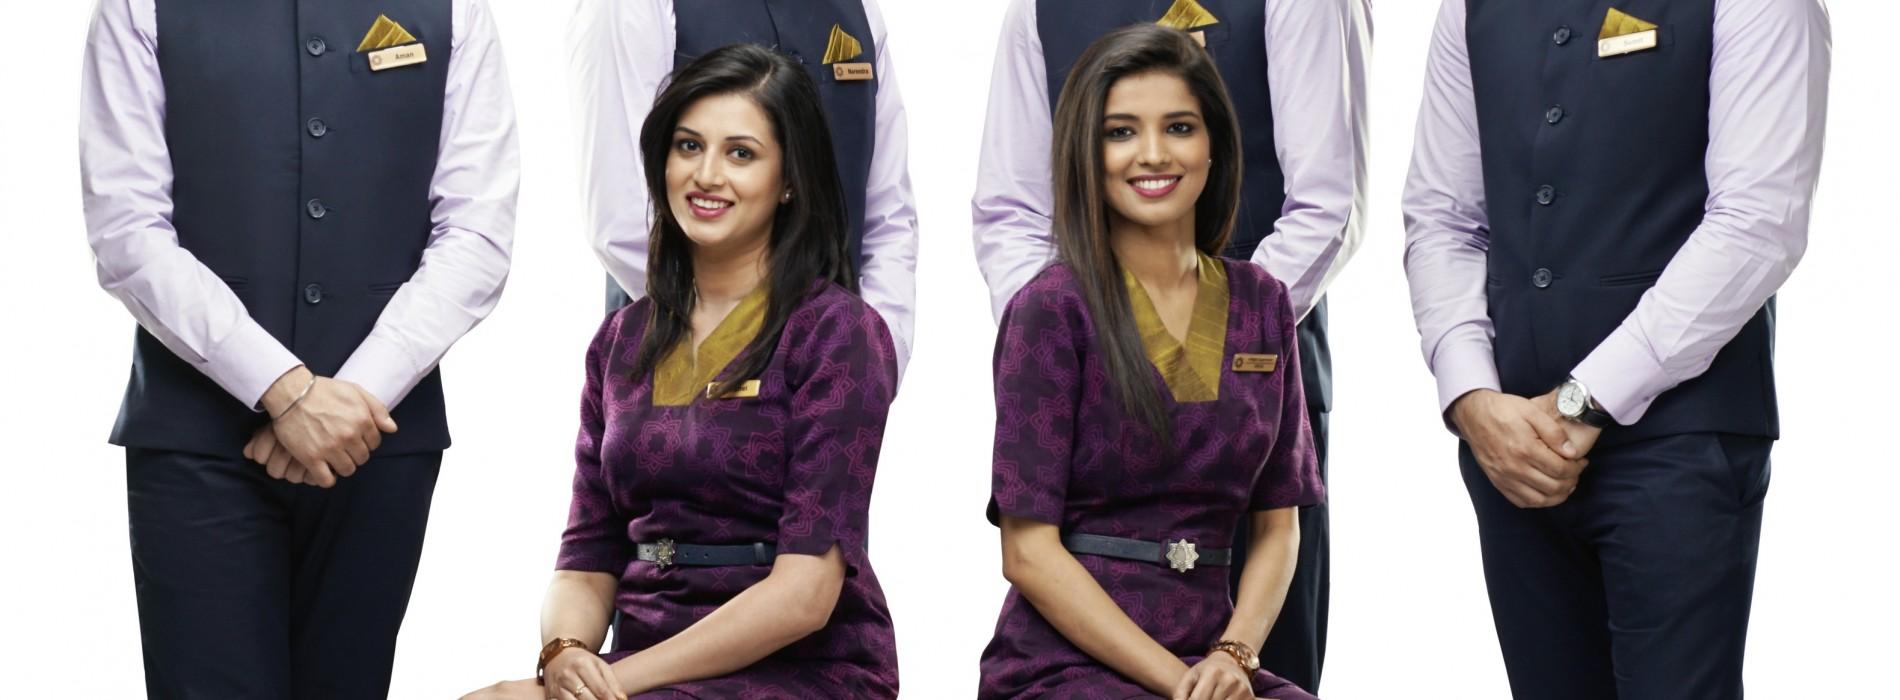 Vistara introduces male cabin crew on flights